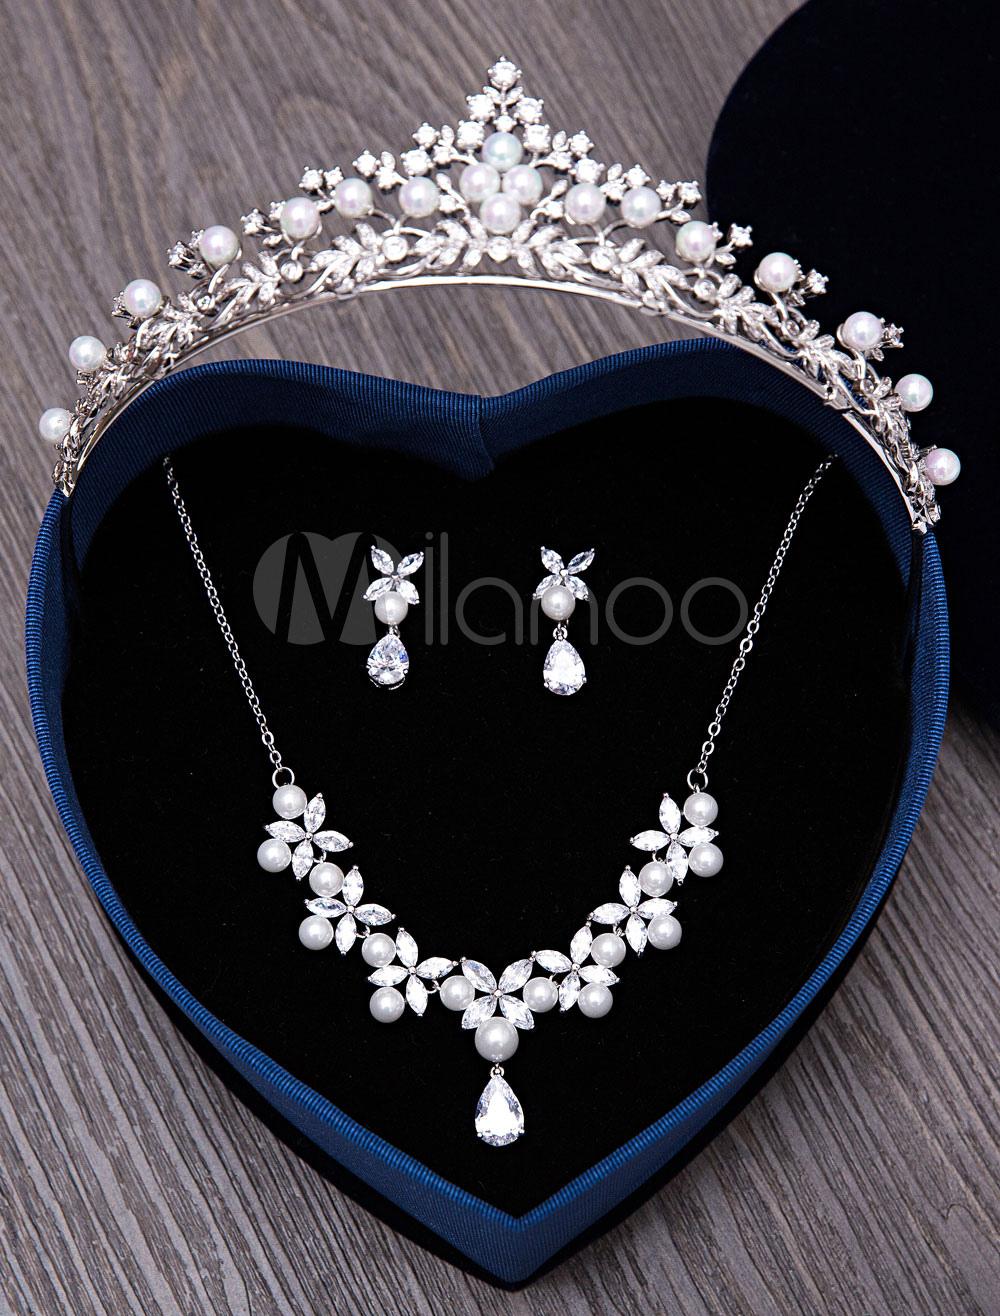 Wedding Jewelry Set Silver Pearls Rhinestones Bridal Jewelry Set In 3 Piece